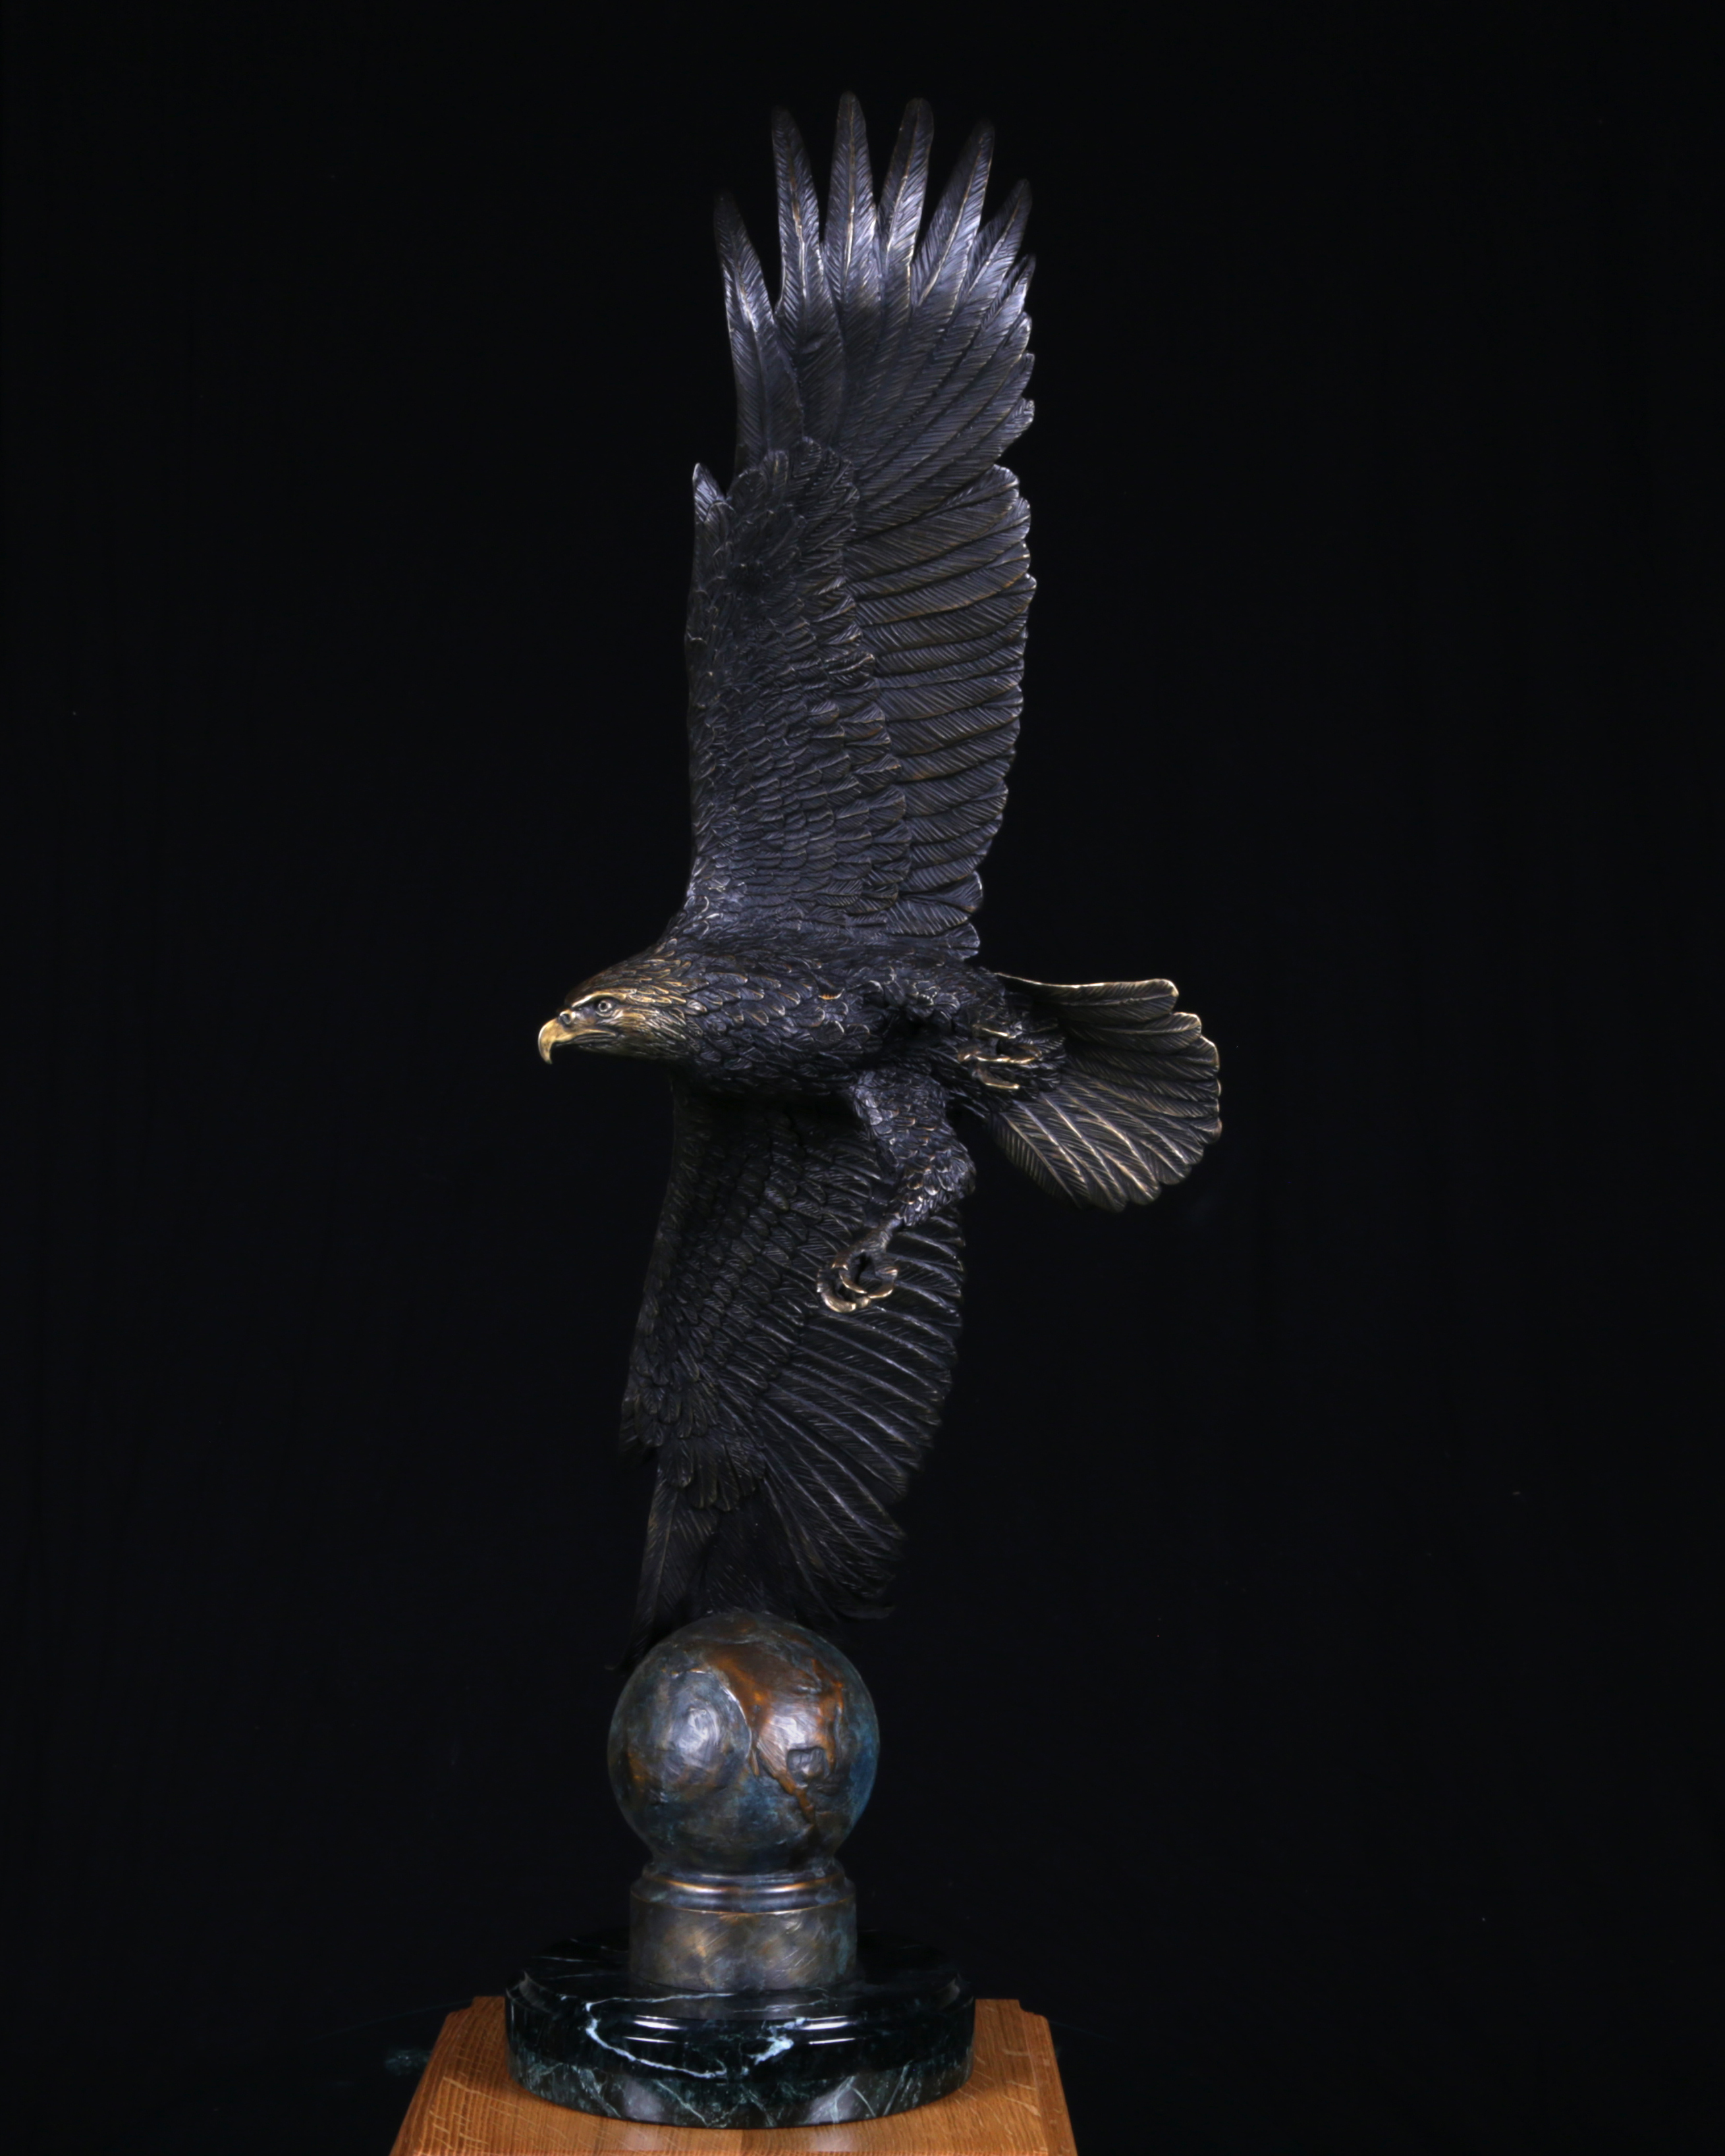 Soaring Freedom, America Bald Eagle